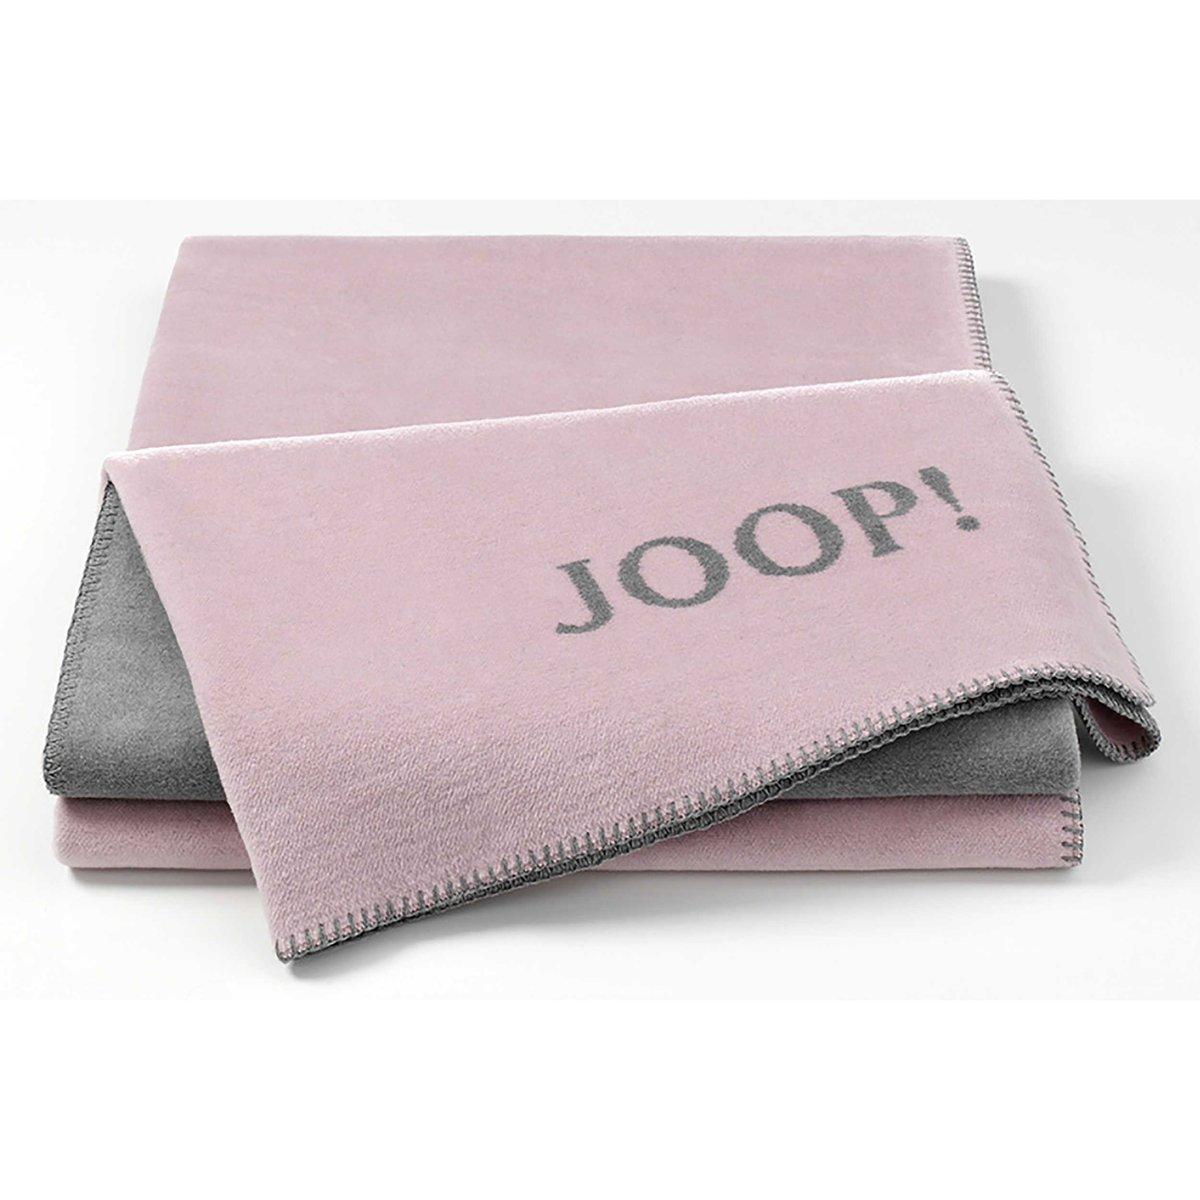 Bild 1 von JOOP! Kuscheldecke   Doubleface 150 x 200 cm